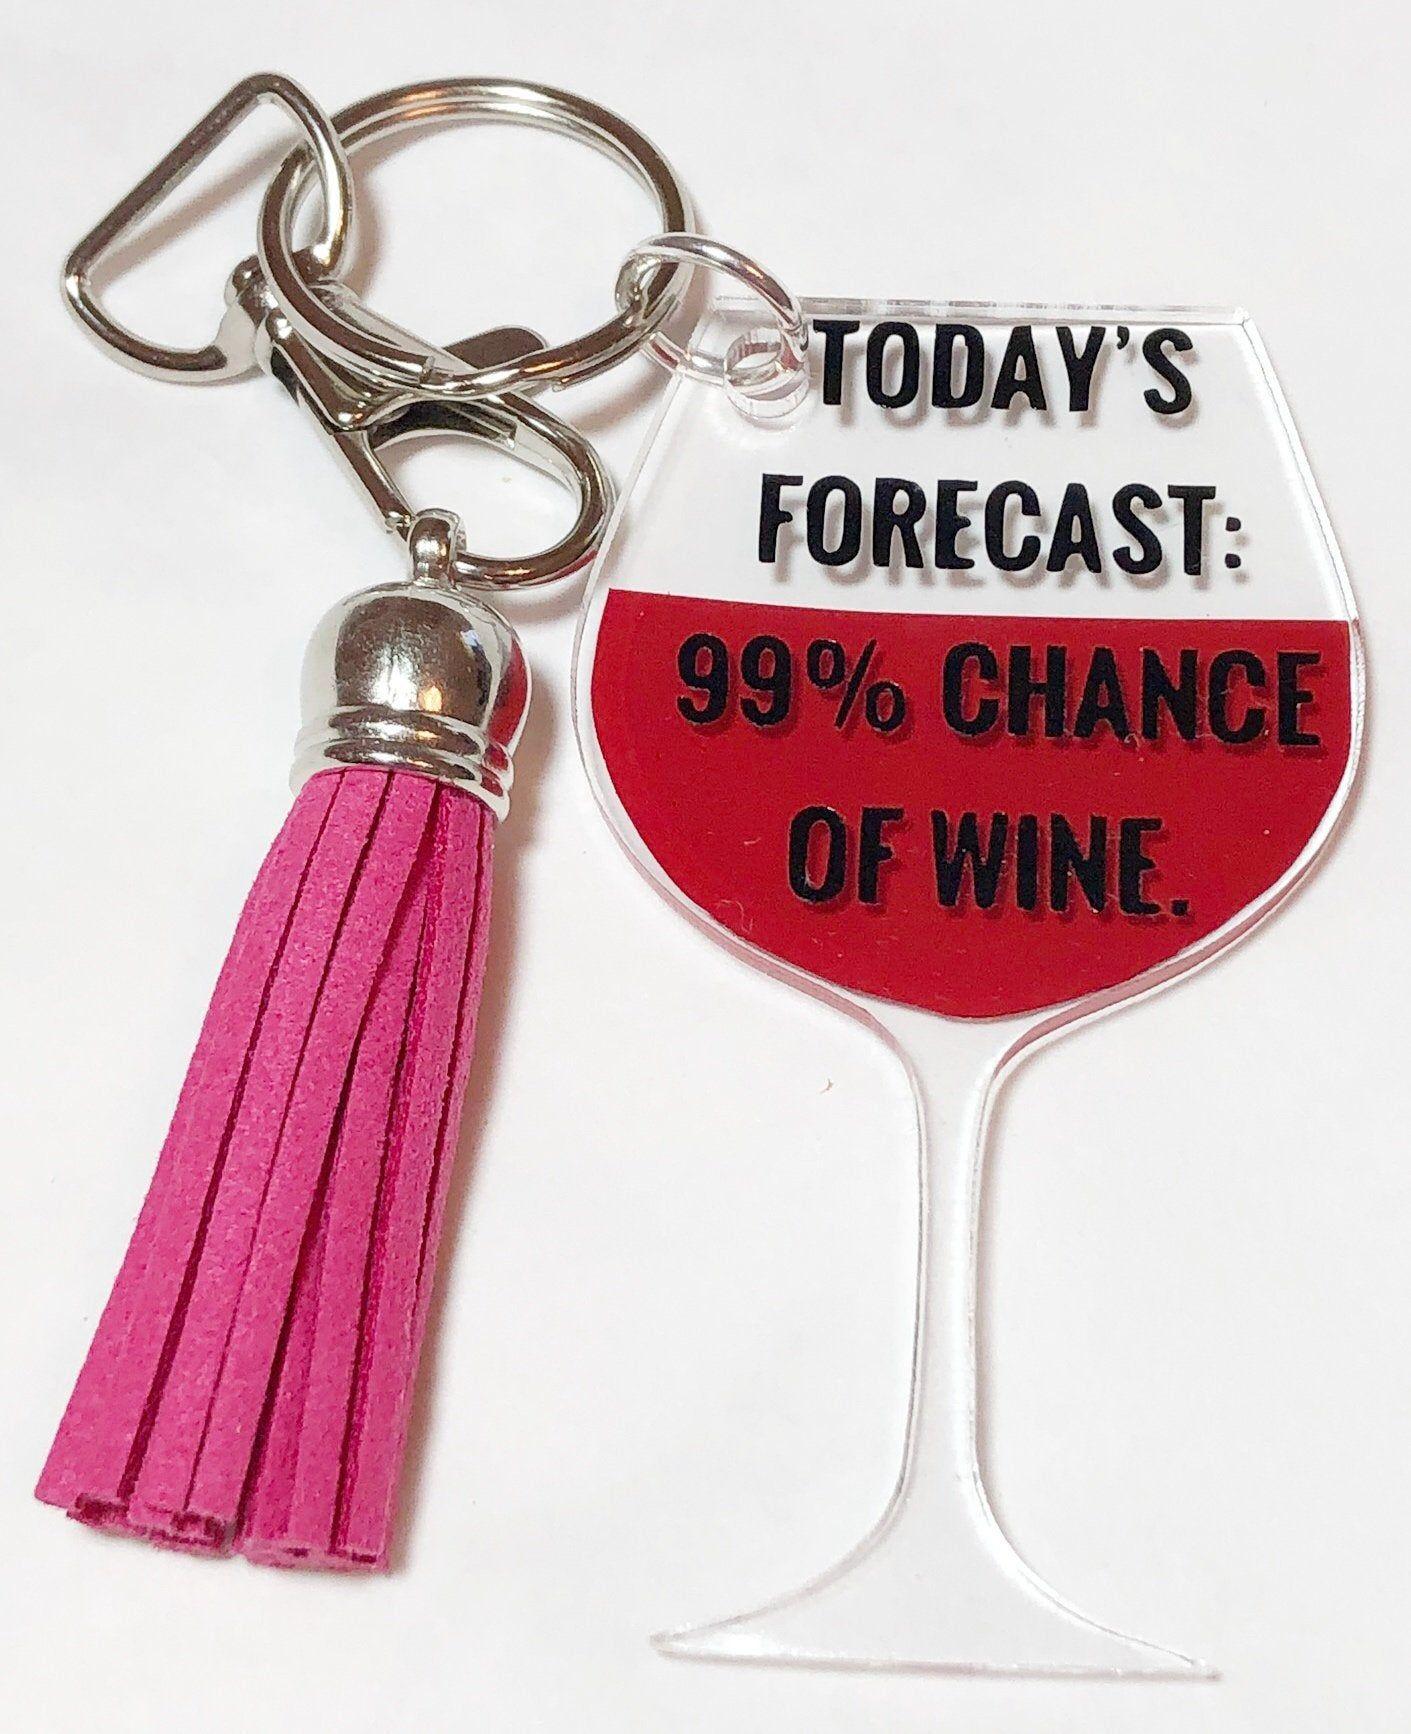 Wine Glass Shaped Keychain Keychain For Wine Lover Wine Lovers Keychain Wine Glass